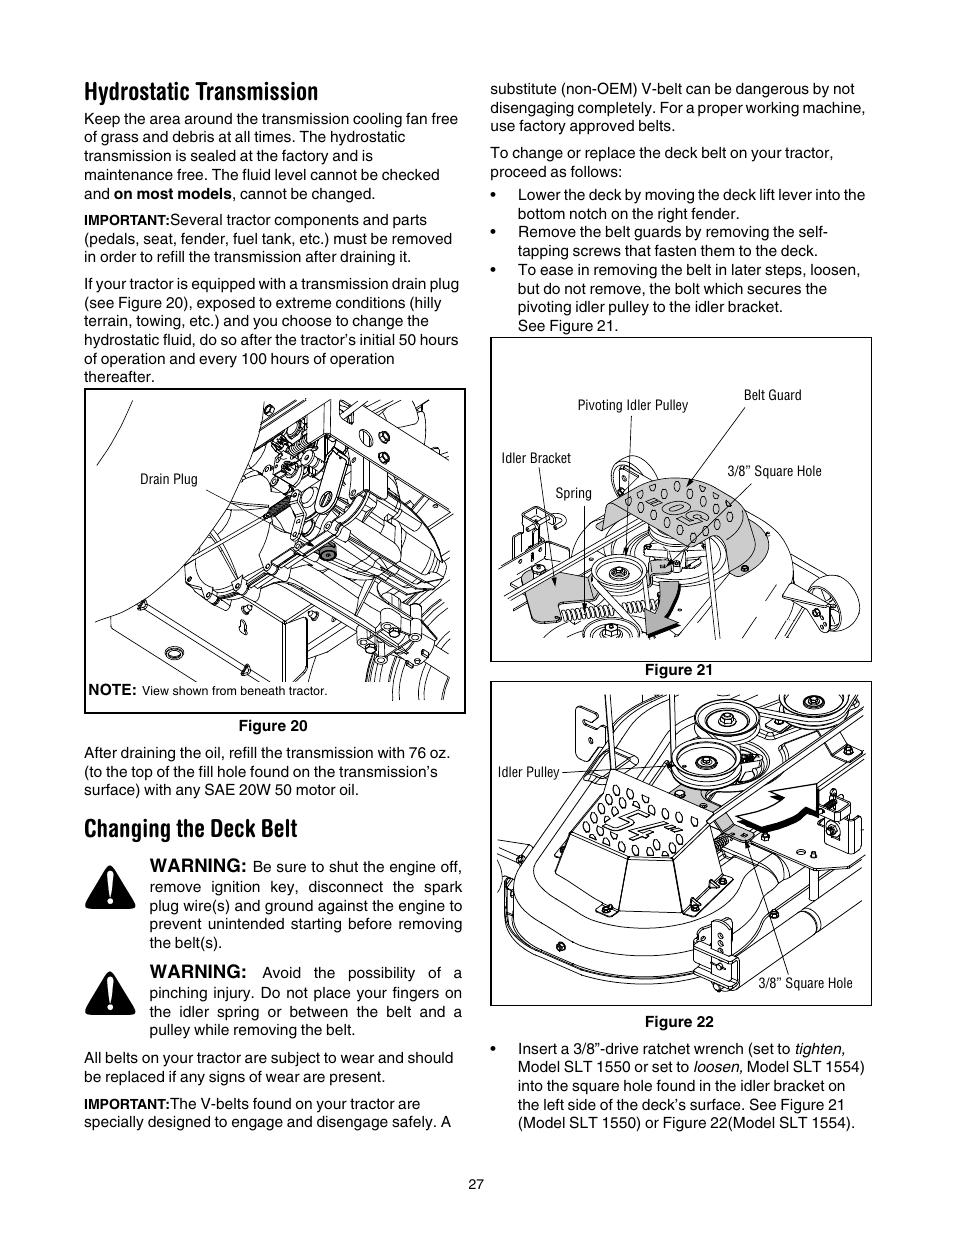 medium resolution of hydrostatic transmission changing the deck belt cub cadet slt1554 user manual page 27 40